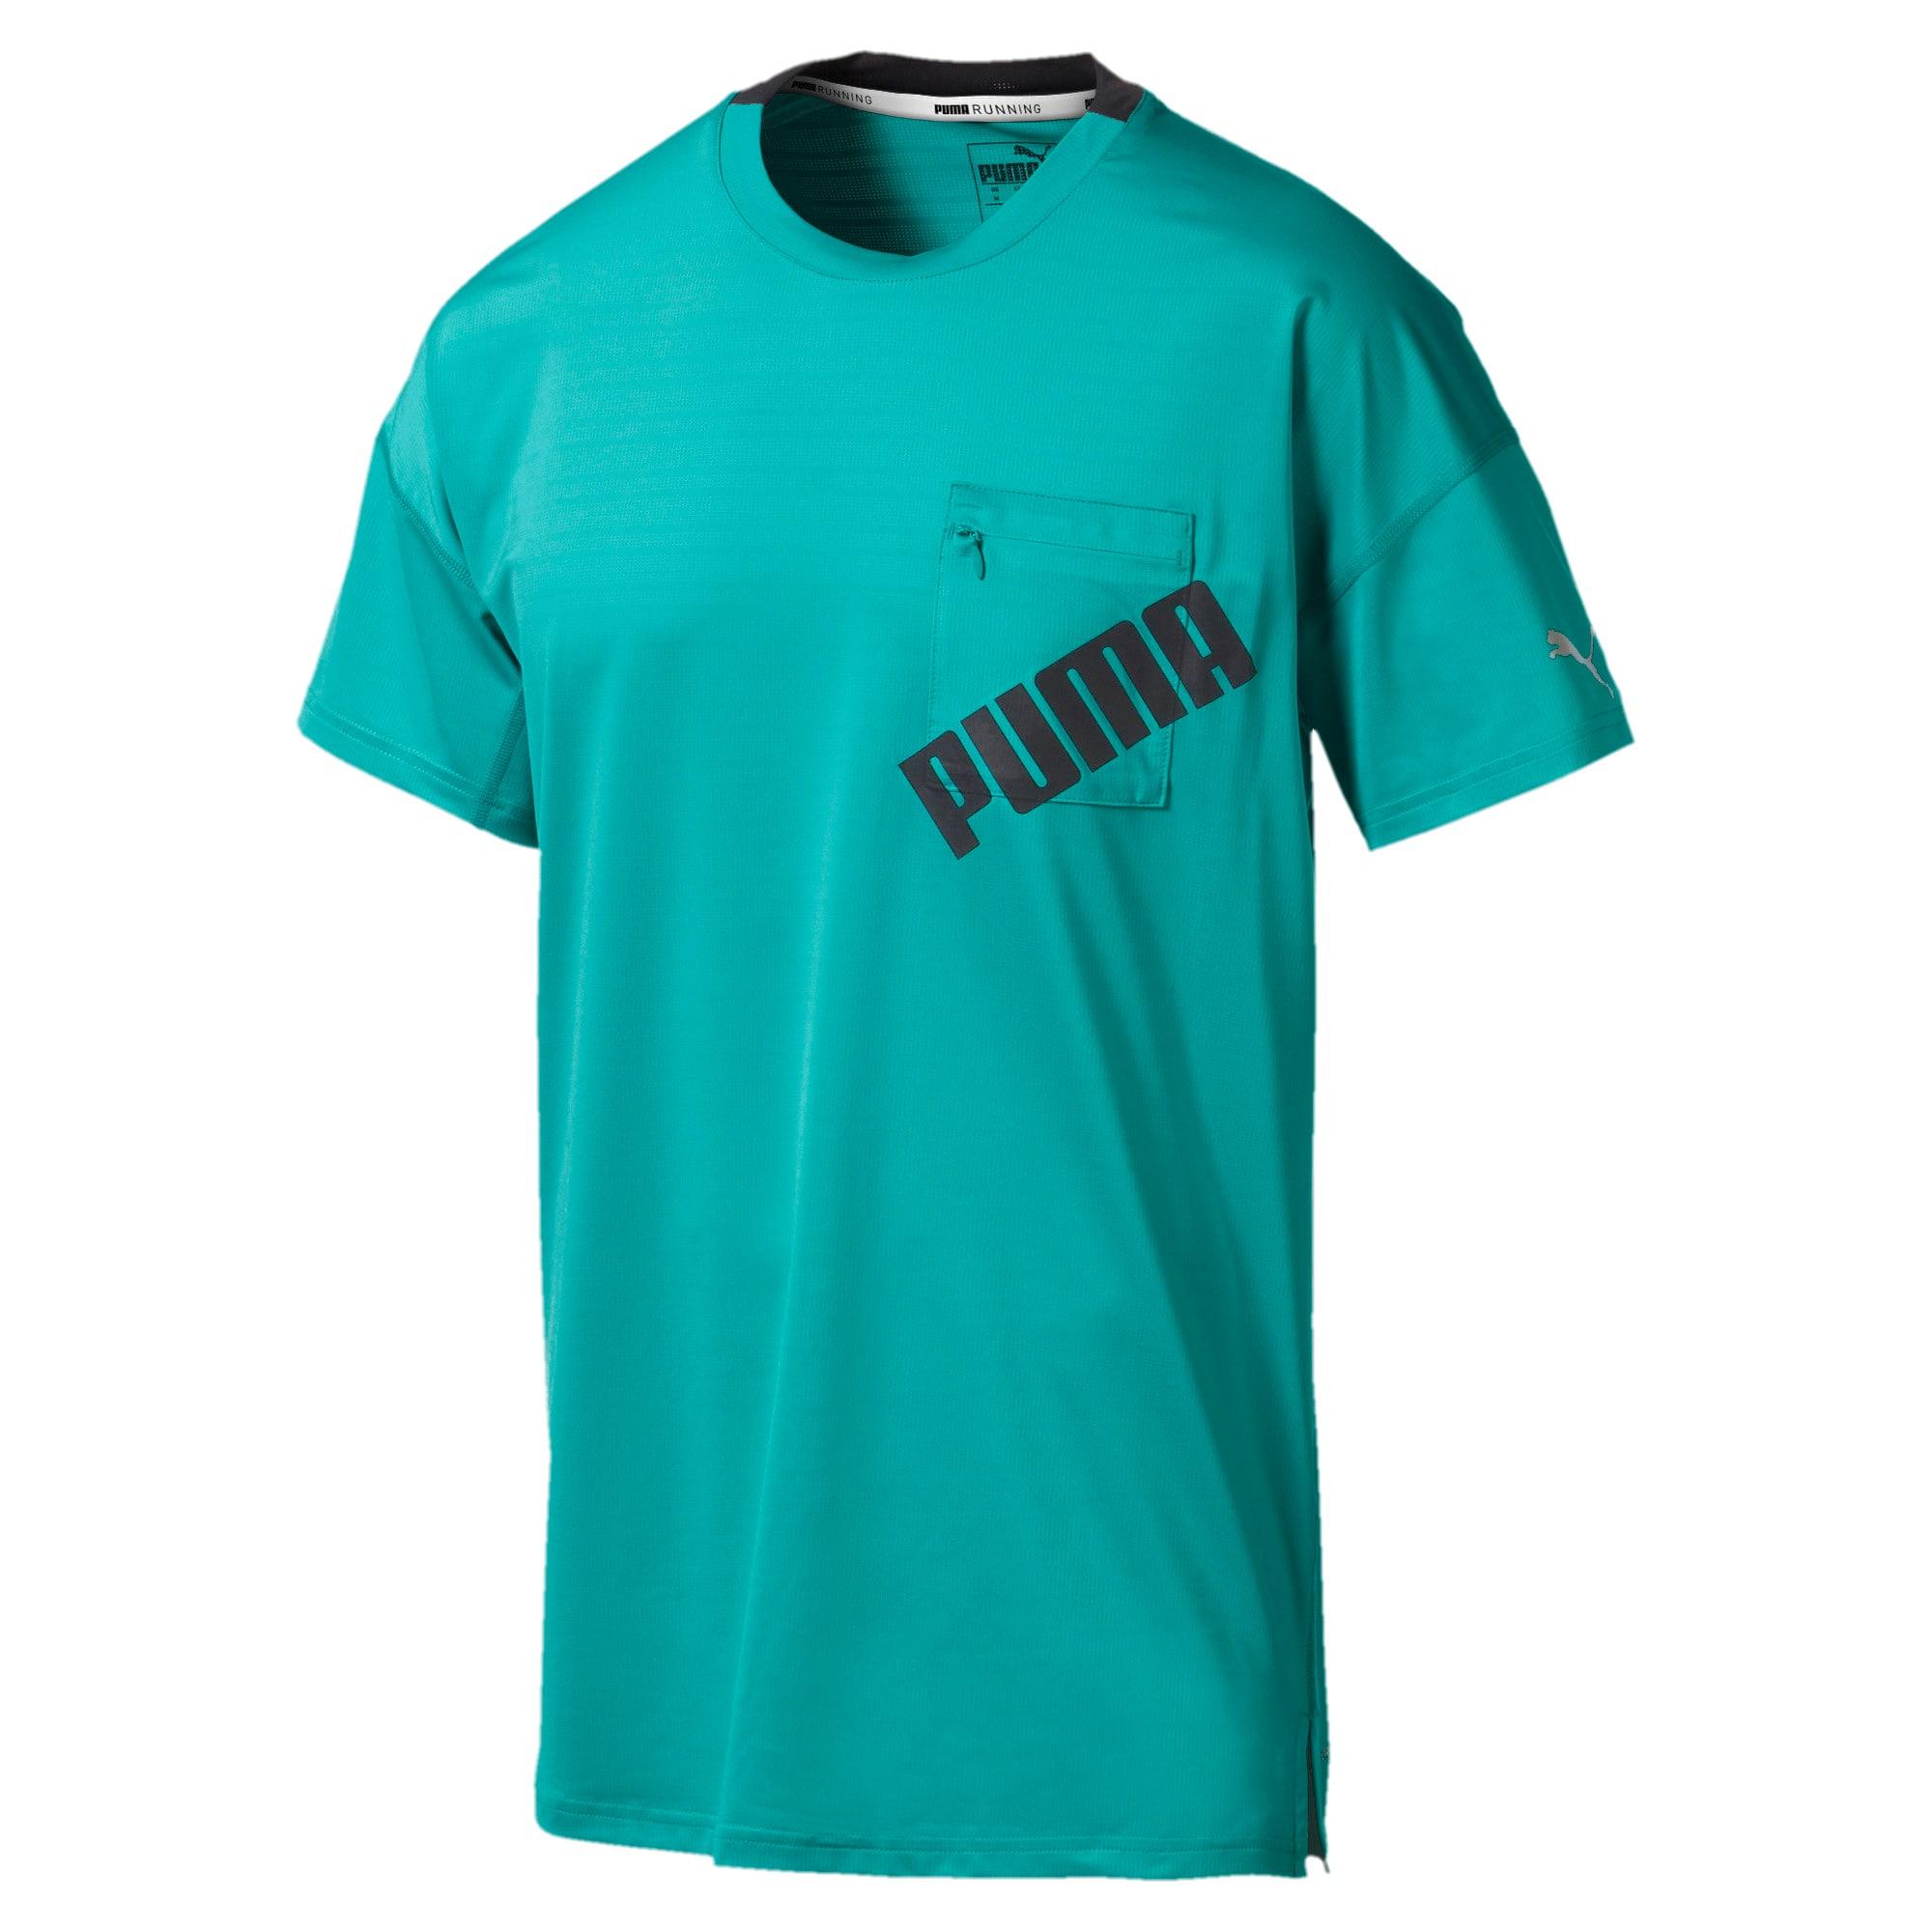 Thumbnail 4 of Get Fast Excite hardloopshirt voor heren, Blue Turquoise-Puma Black, medium